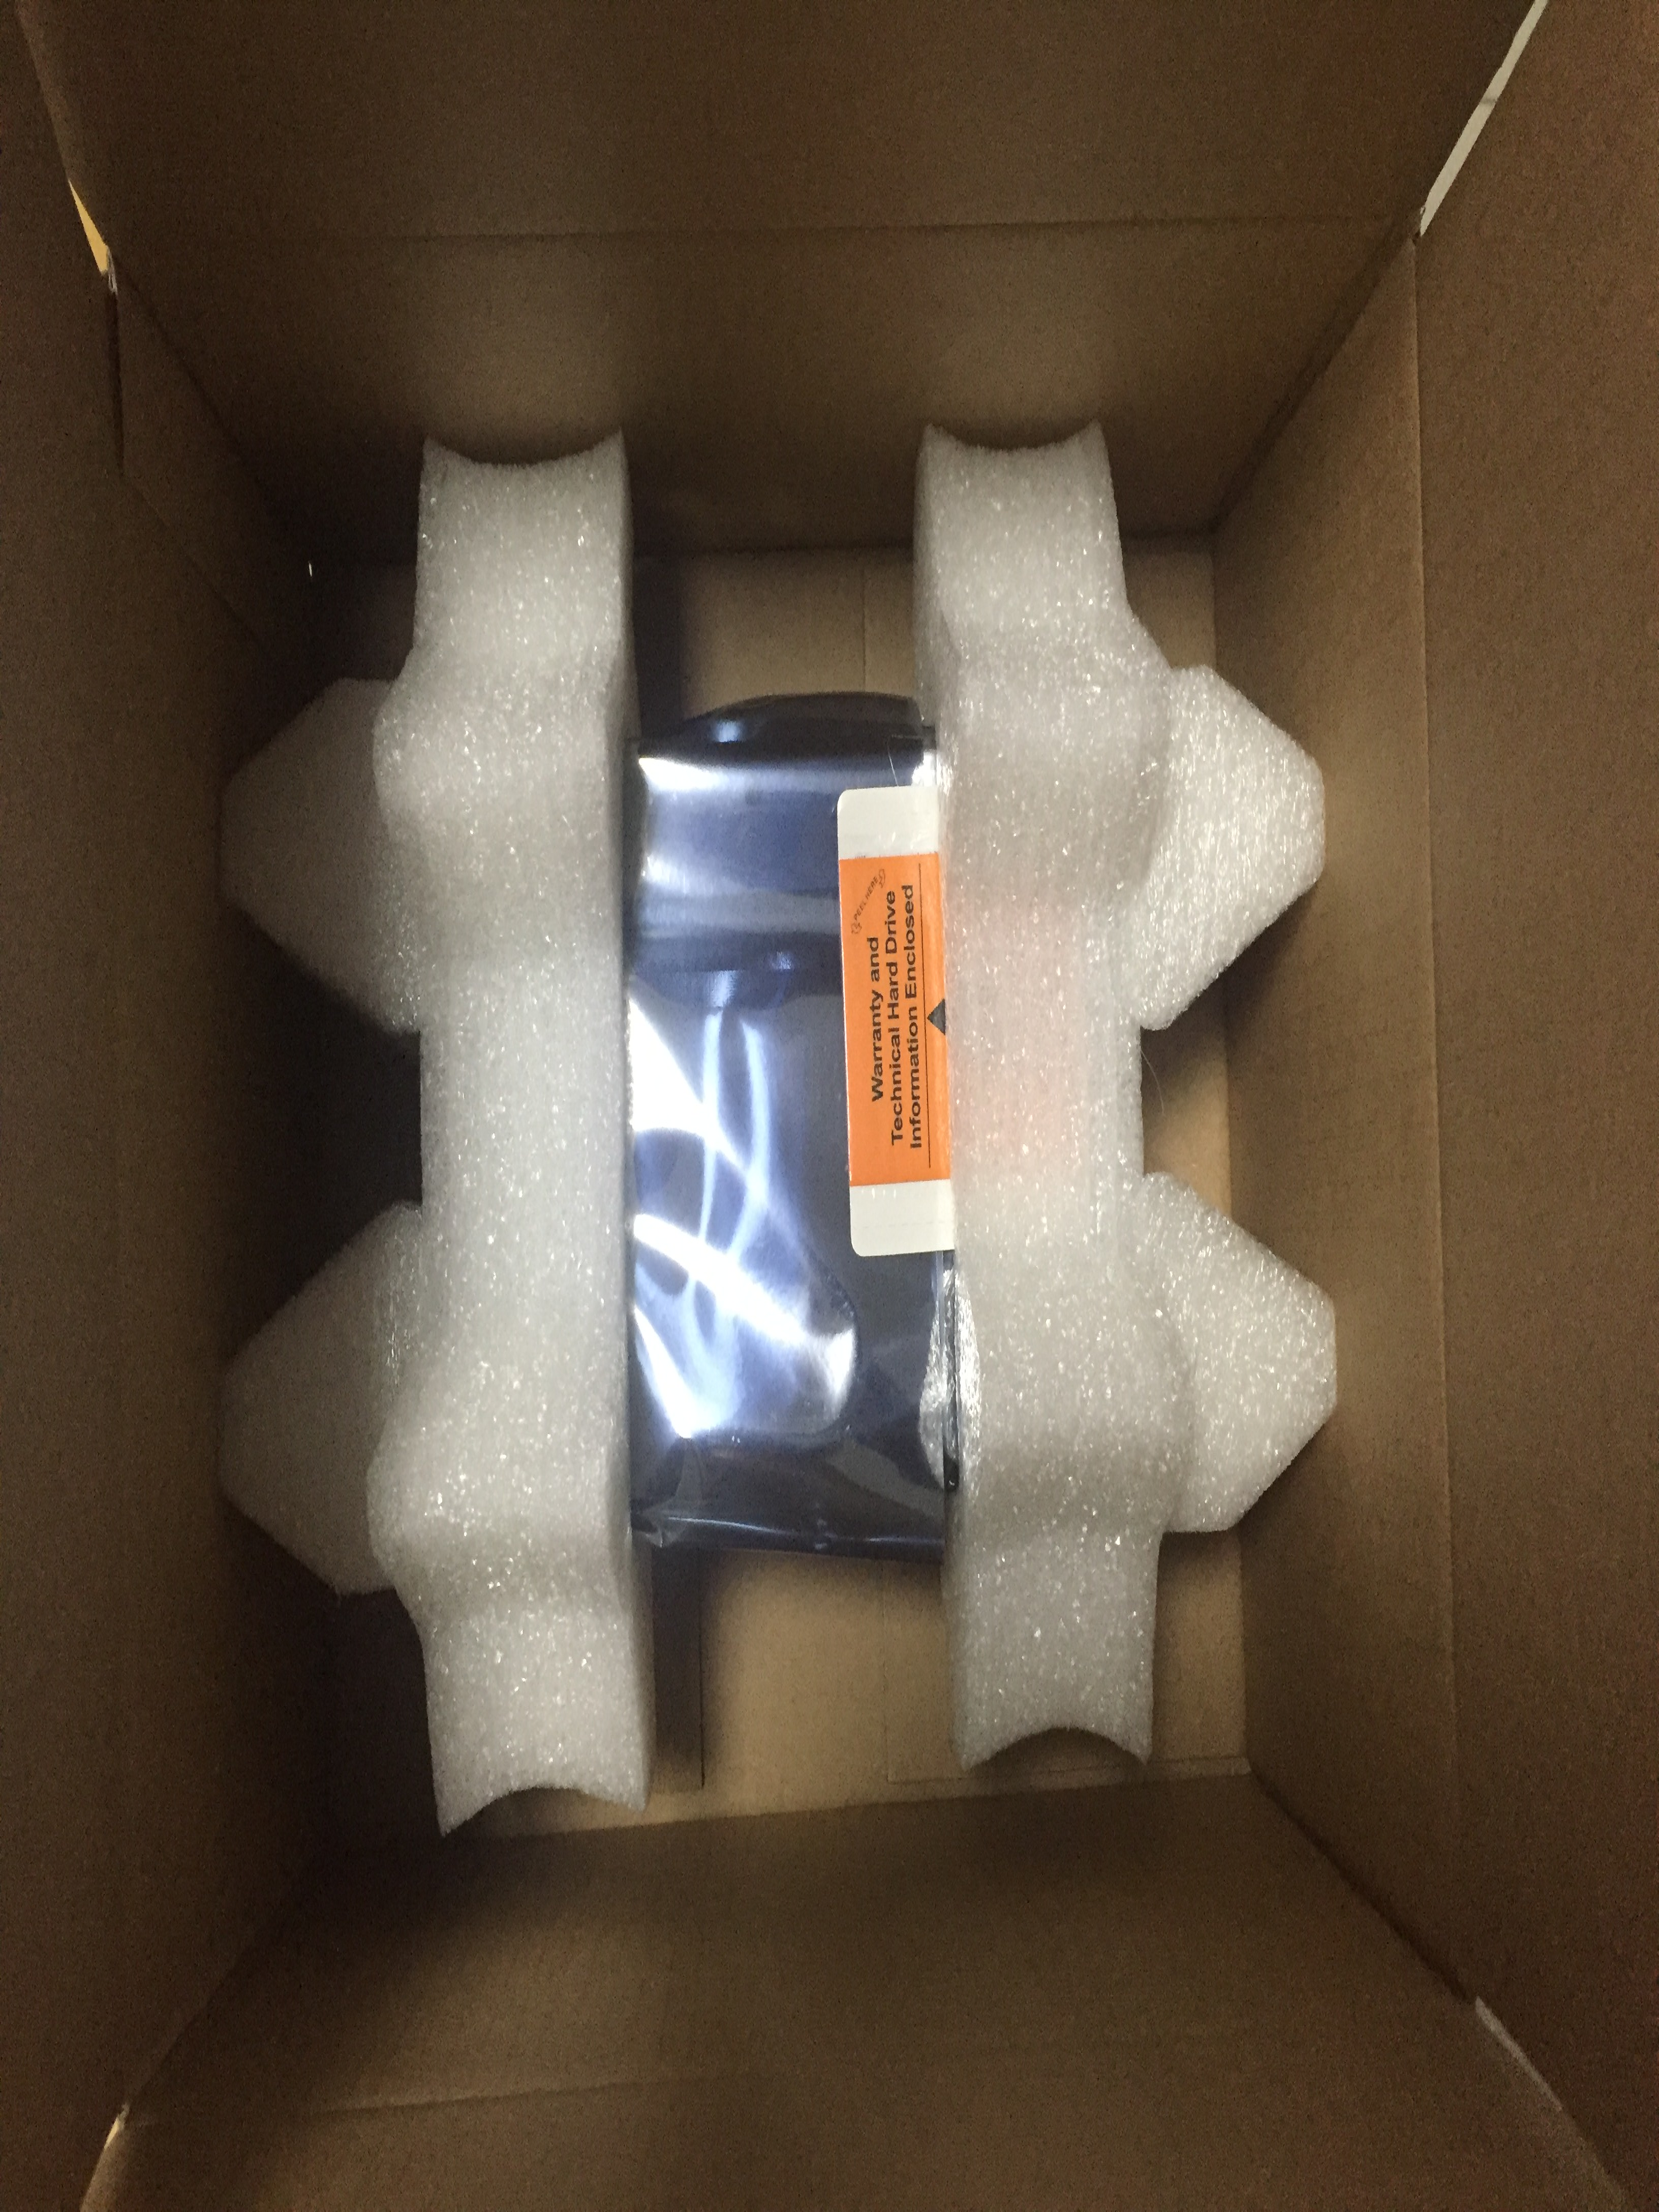 New for 42D0612 42D0613 300G 10K SAS    x3850 1 year warranty 492620 s21 dg0300bahzq dg0300balvp dg0300bamyr dg0300baqpq dg0300bartq 300g 10k 2 5inch sas hdd 1 year warranty